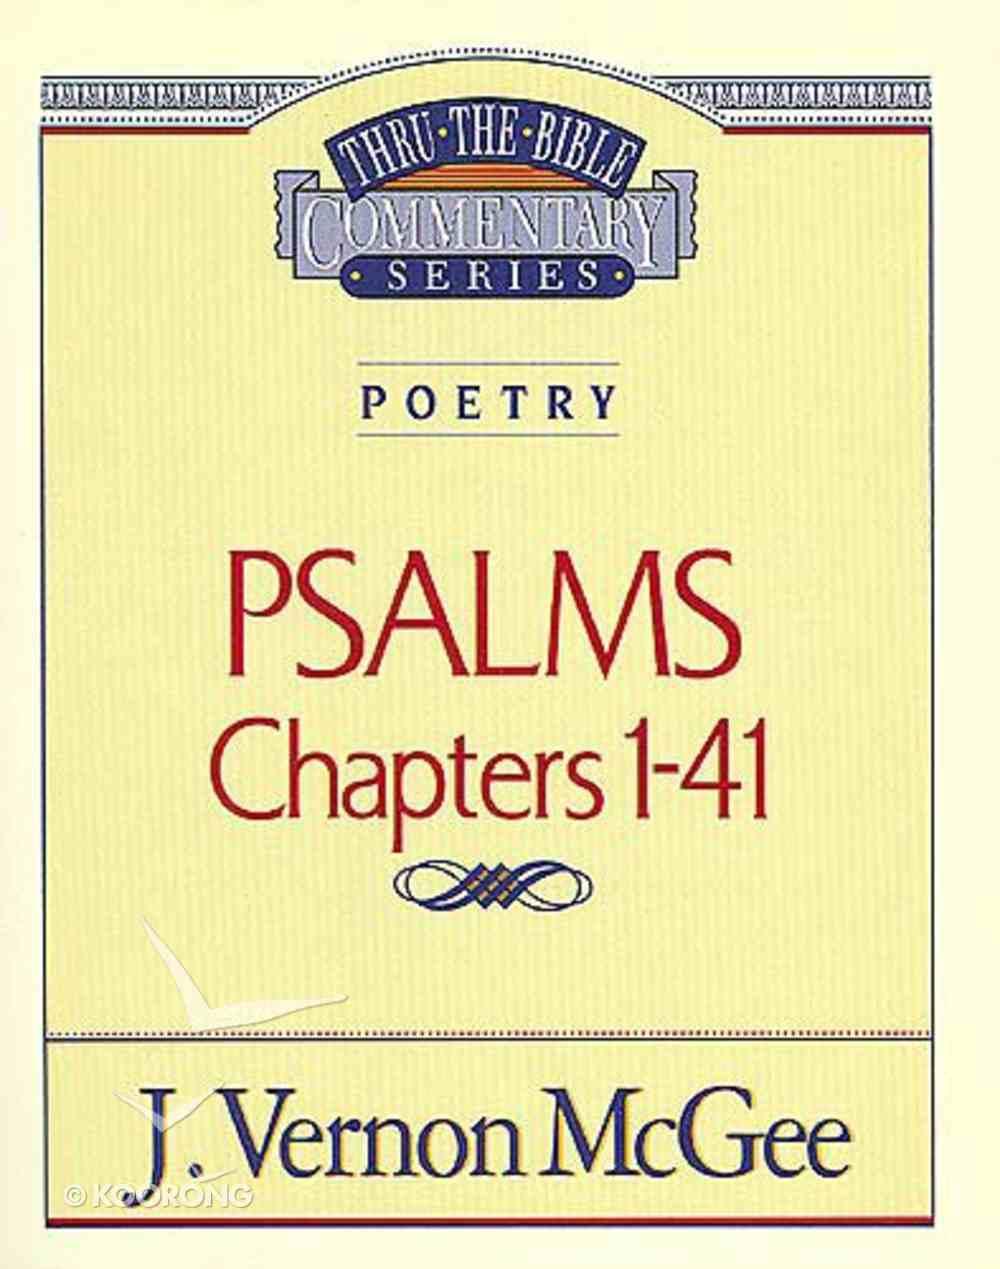 Thru the Bible OT #17: Psalms (Volume 1) (#17 in Thru The Bible Old Testament Series) Paperback